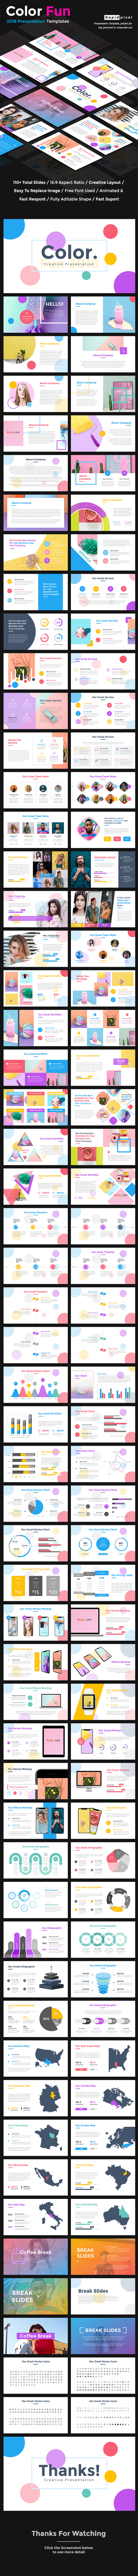 Color Fun 2018 Google Slides Templates - Google Slides Presentation Templates